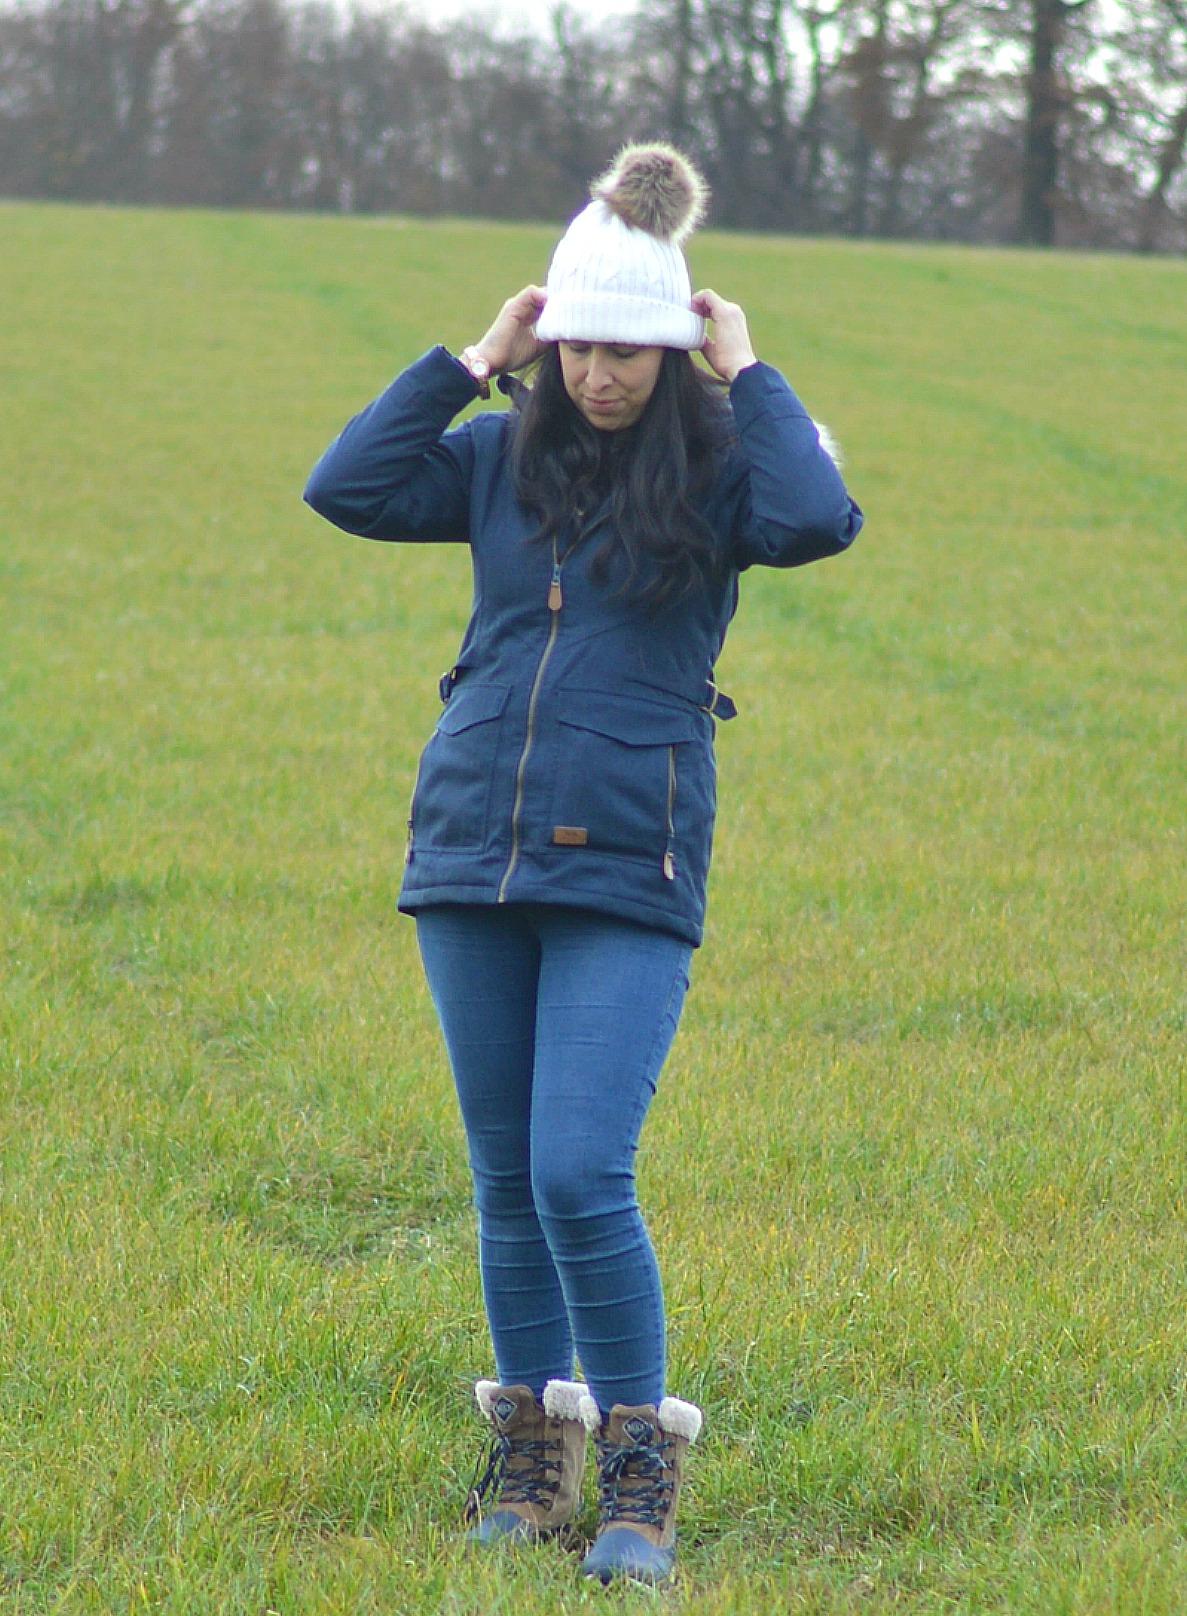 pulling on my winter hat